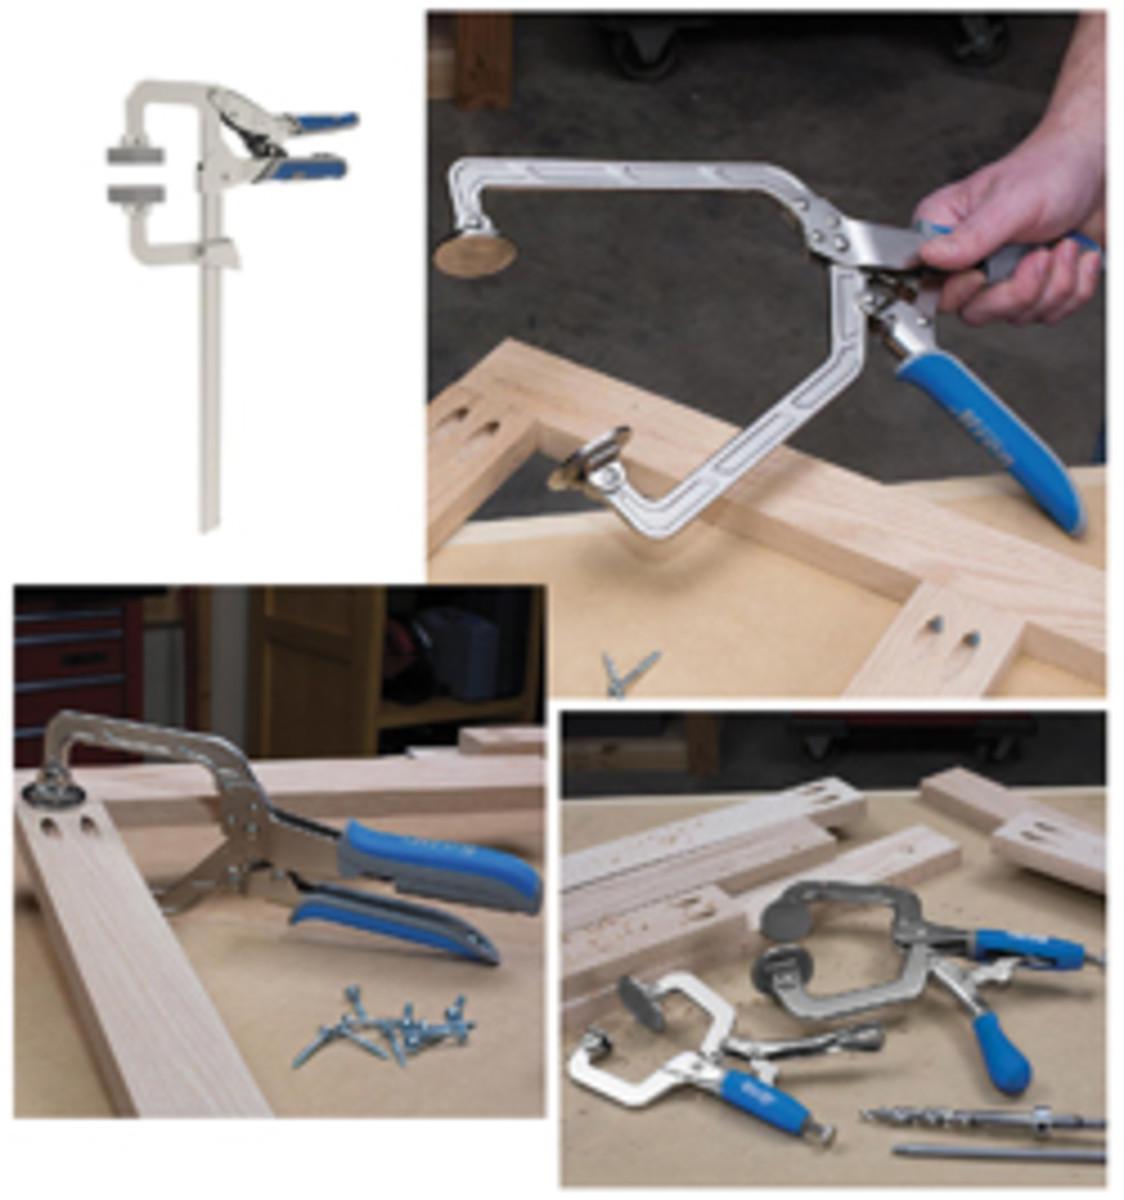 Kreg Tool's Automaxx clamps.